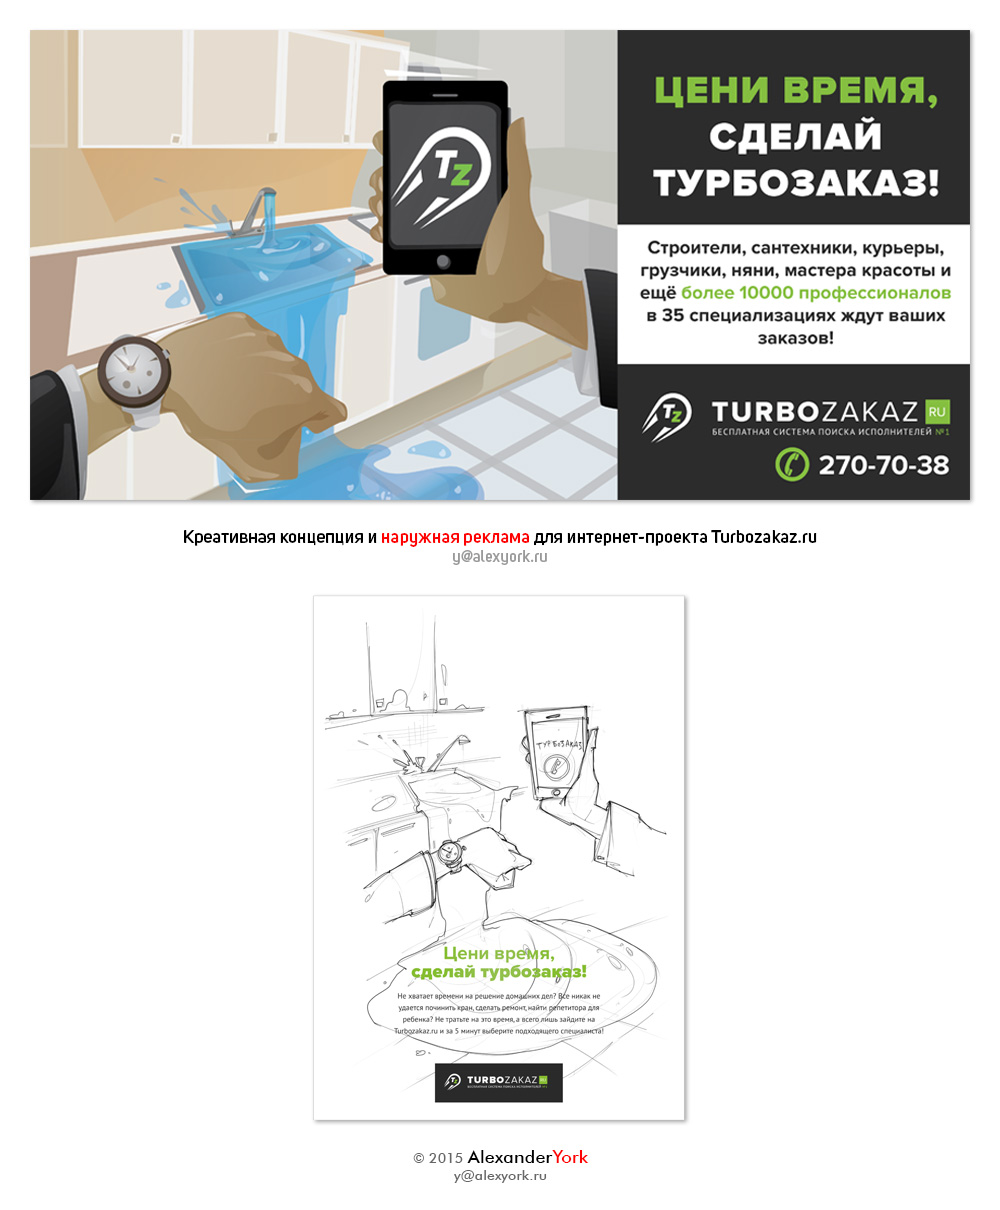 Креативная концепция и наружная реклама для интернет-проекта